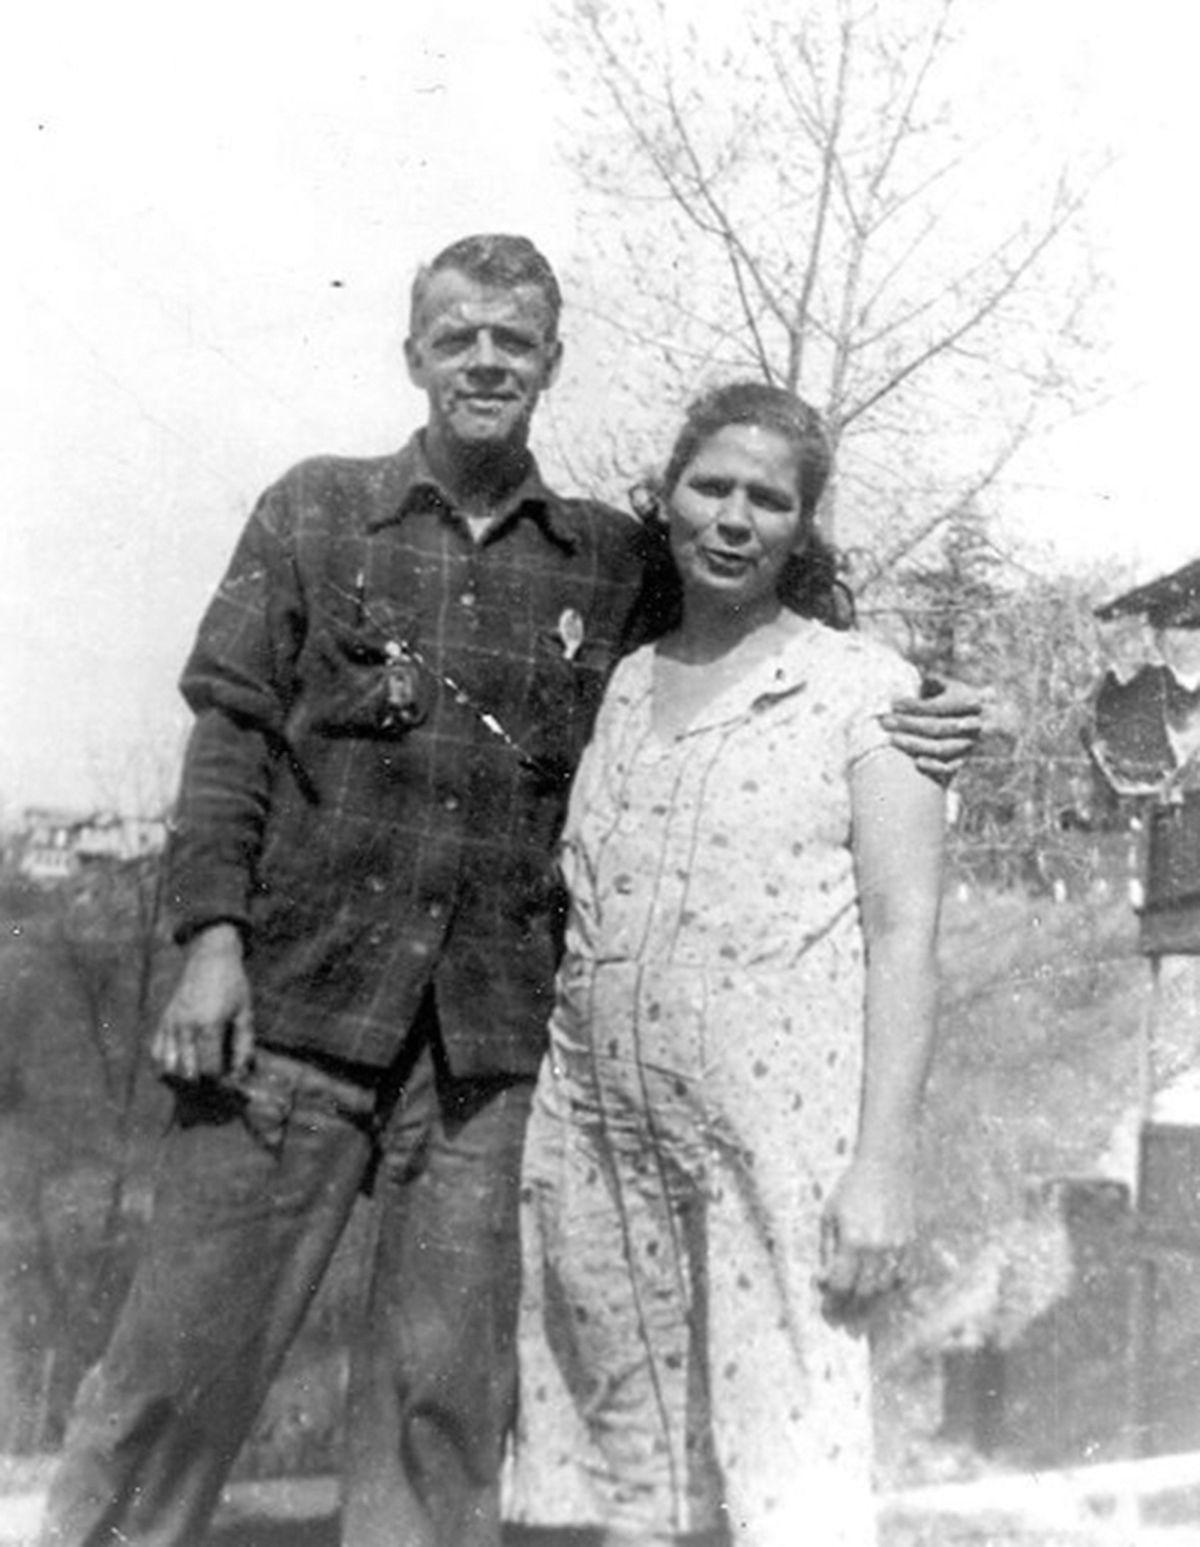 Joe Burbau and Delia Bissette